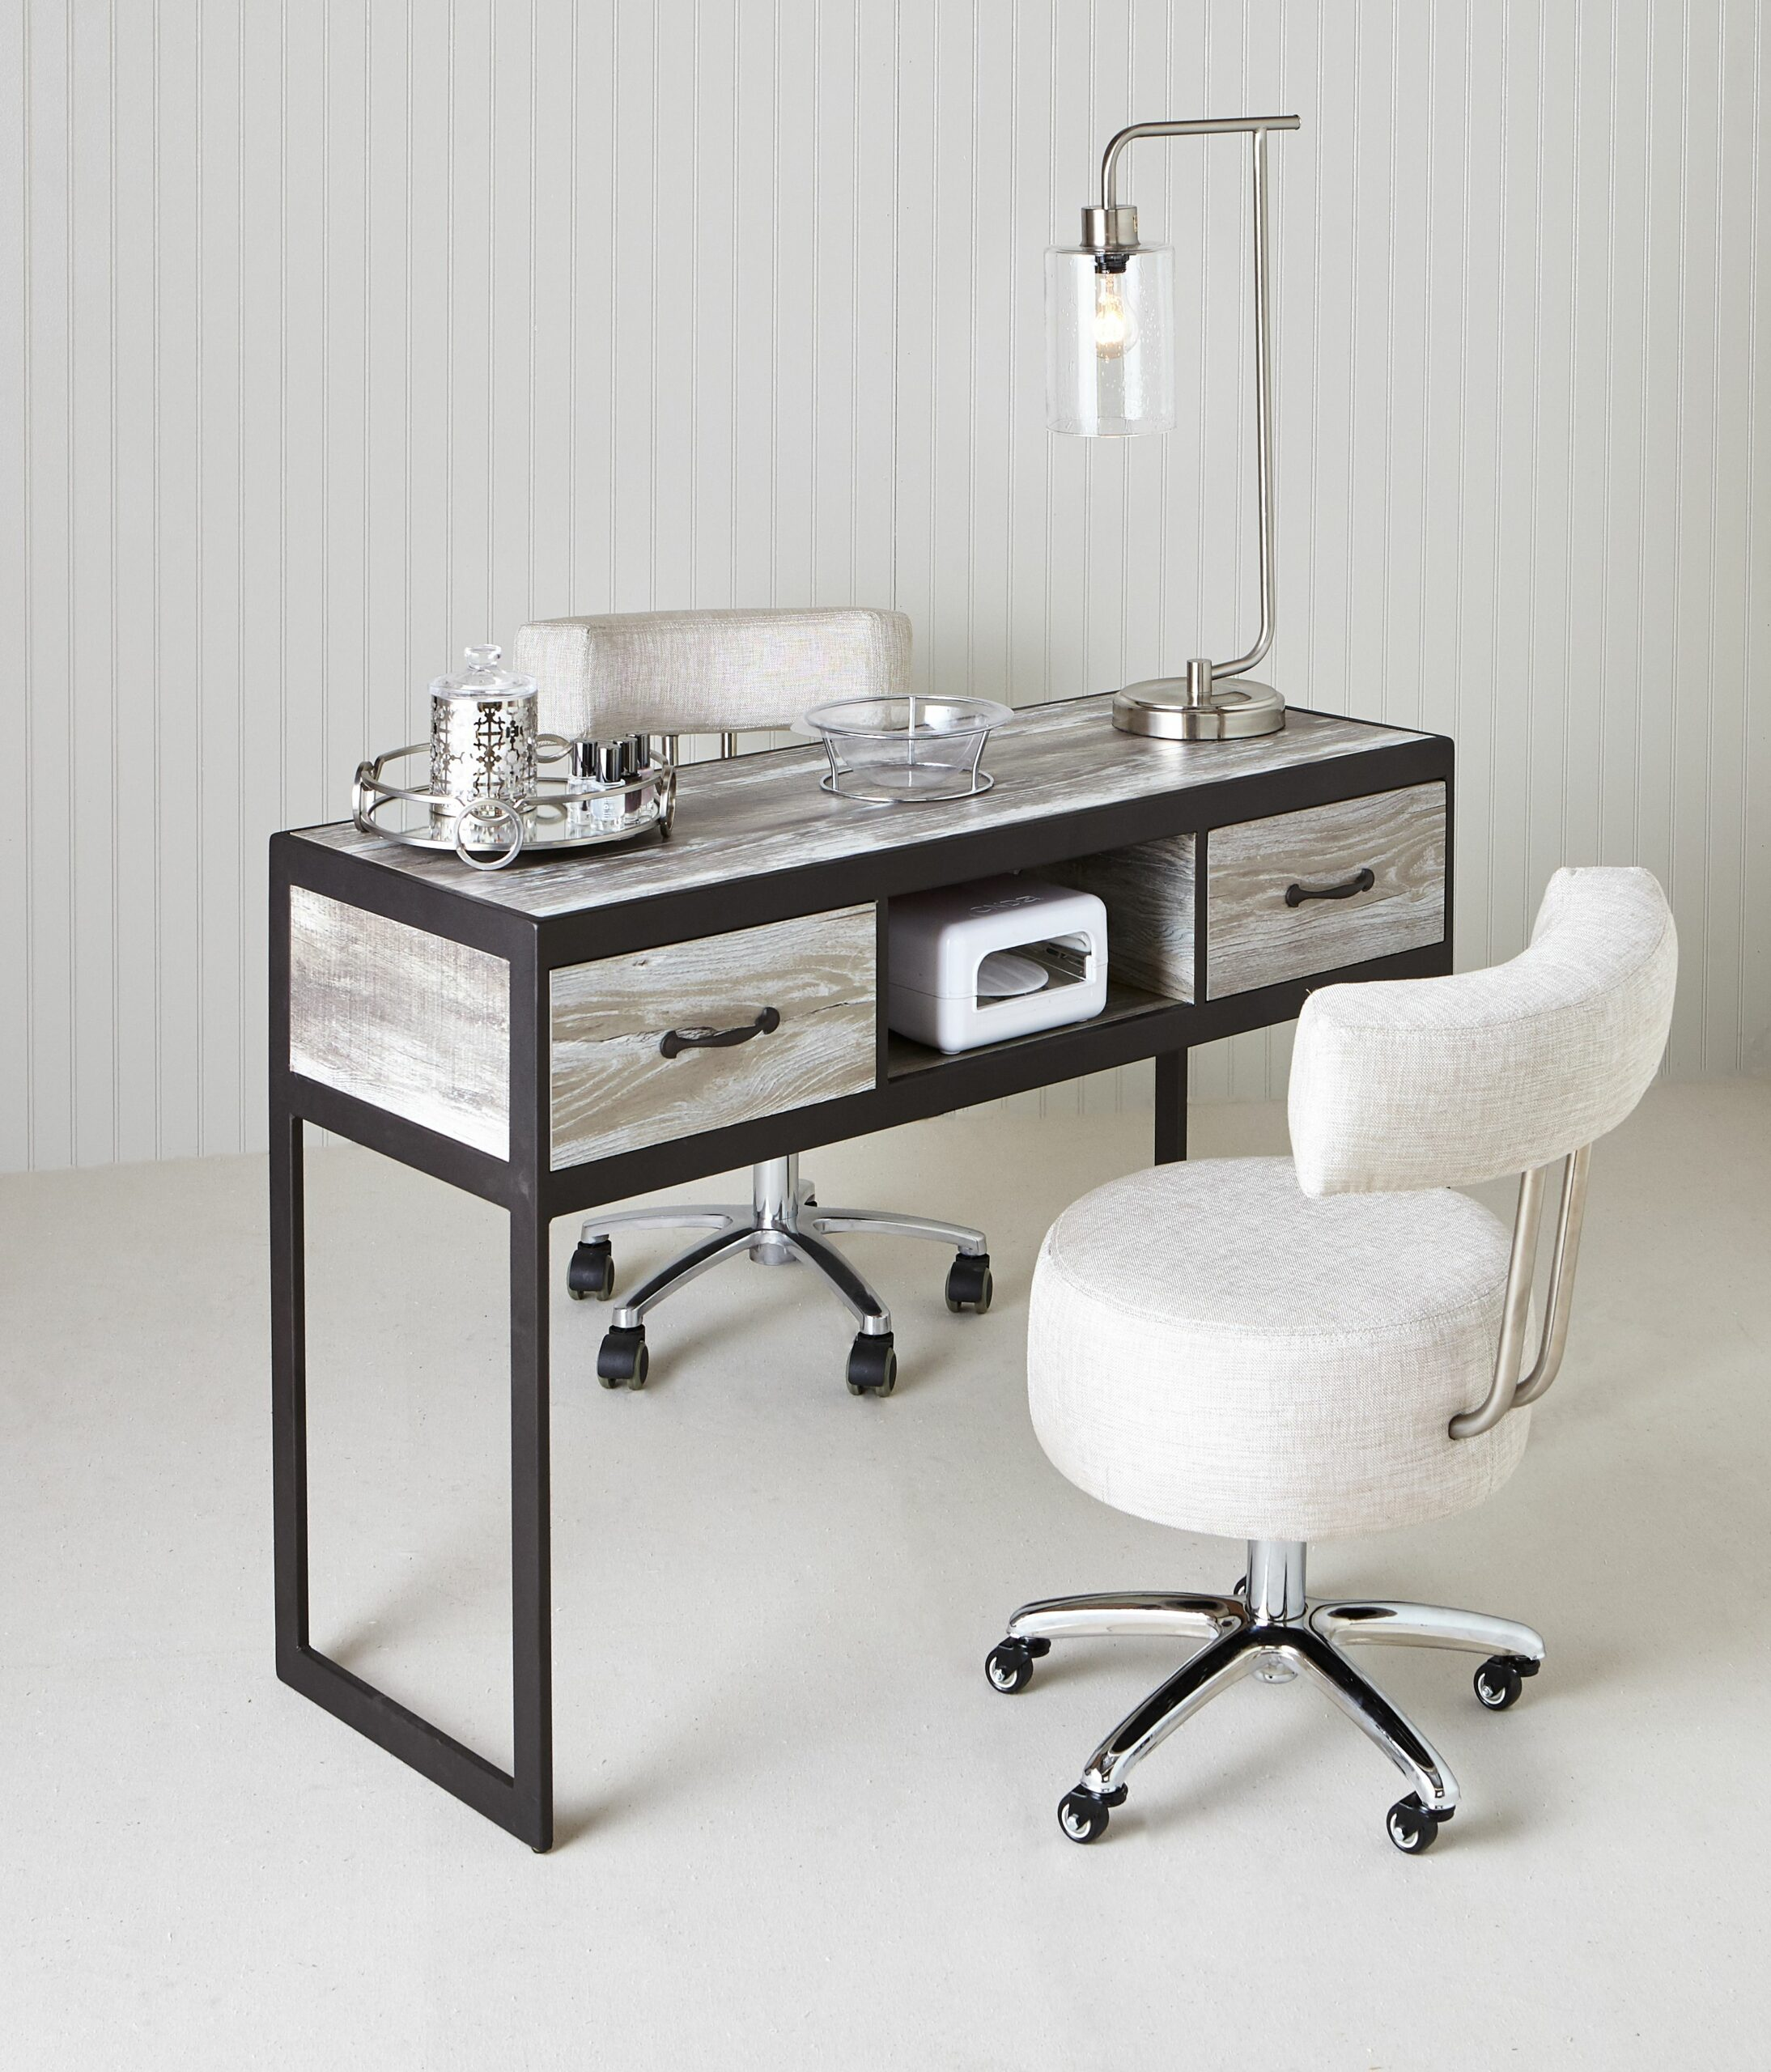 Nail Salon Table Design